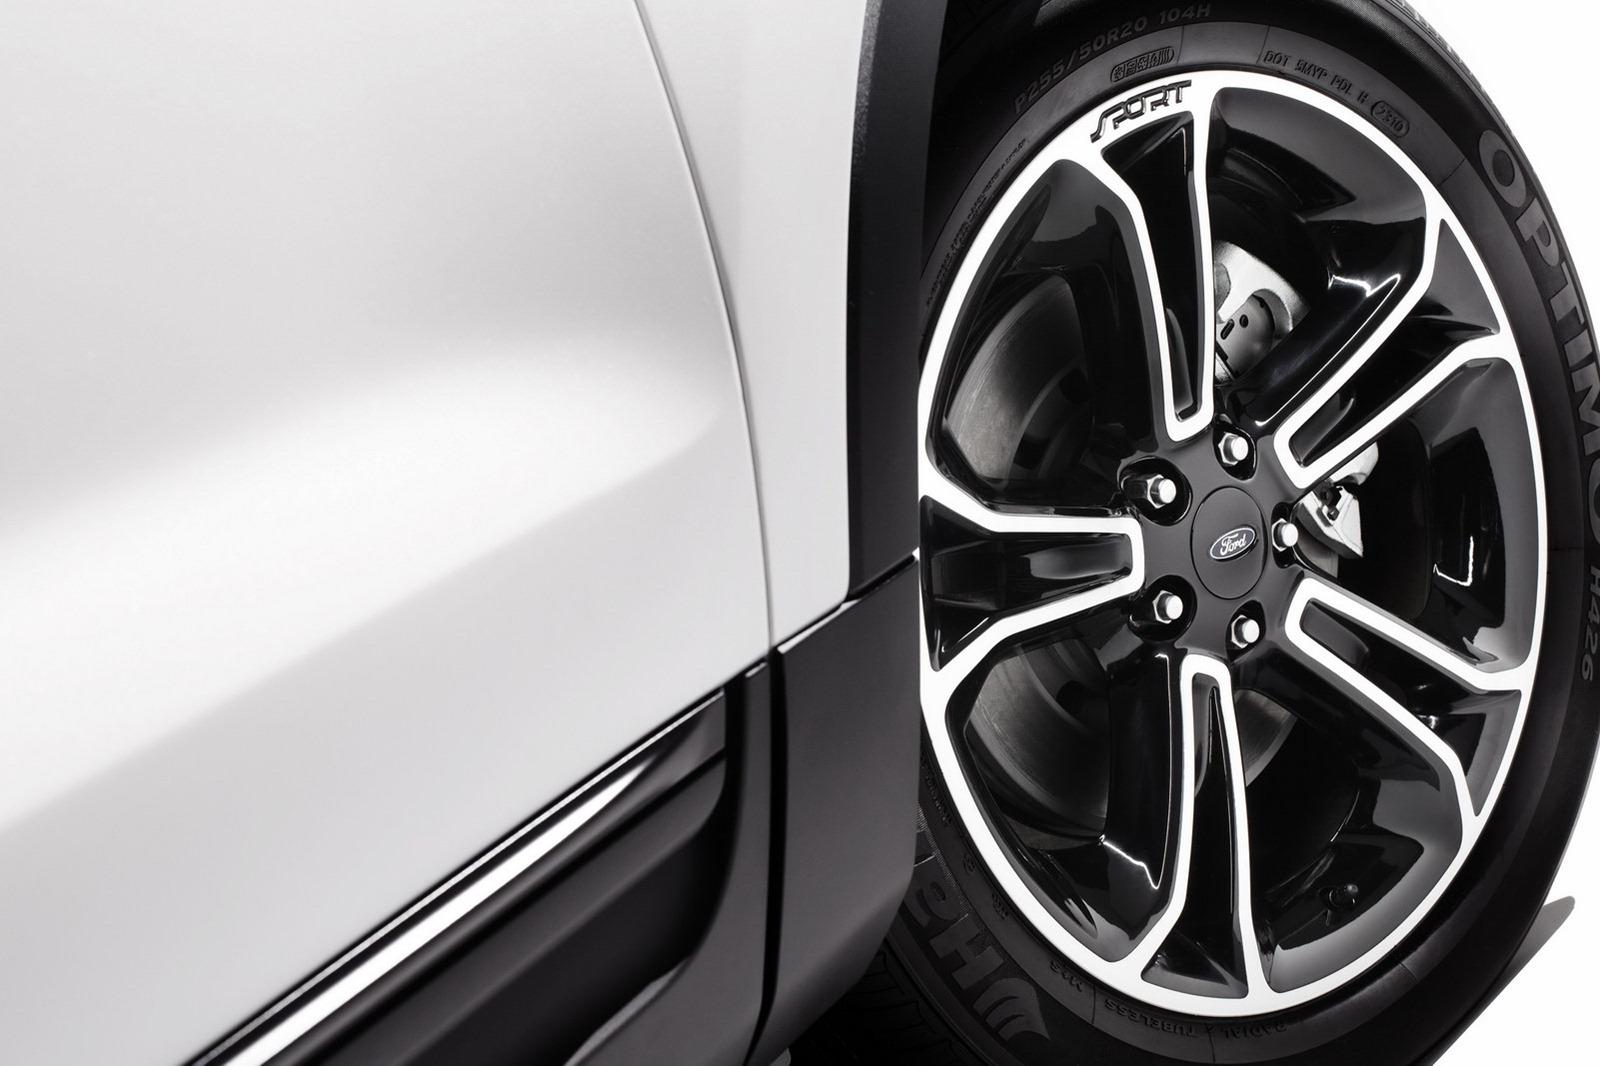 2013 ford explorer sport autoevolution - Red Ford Explorer Black Rims